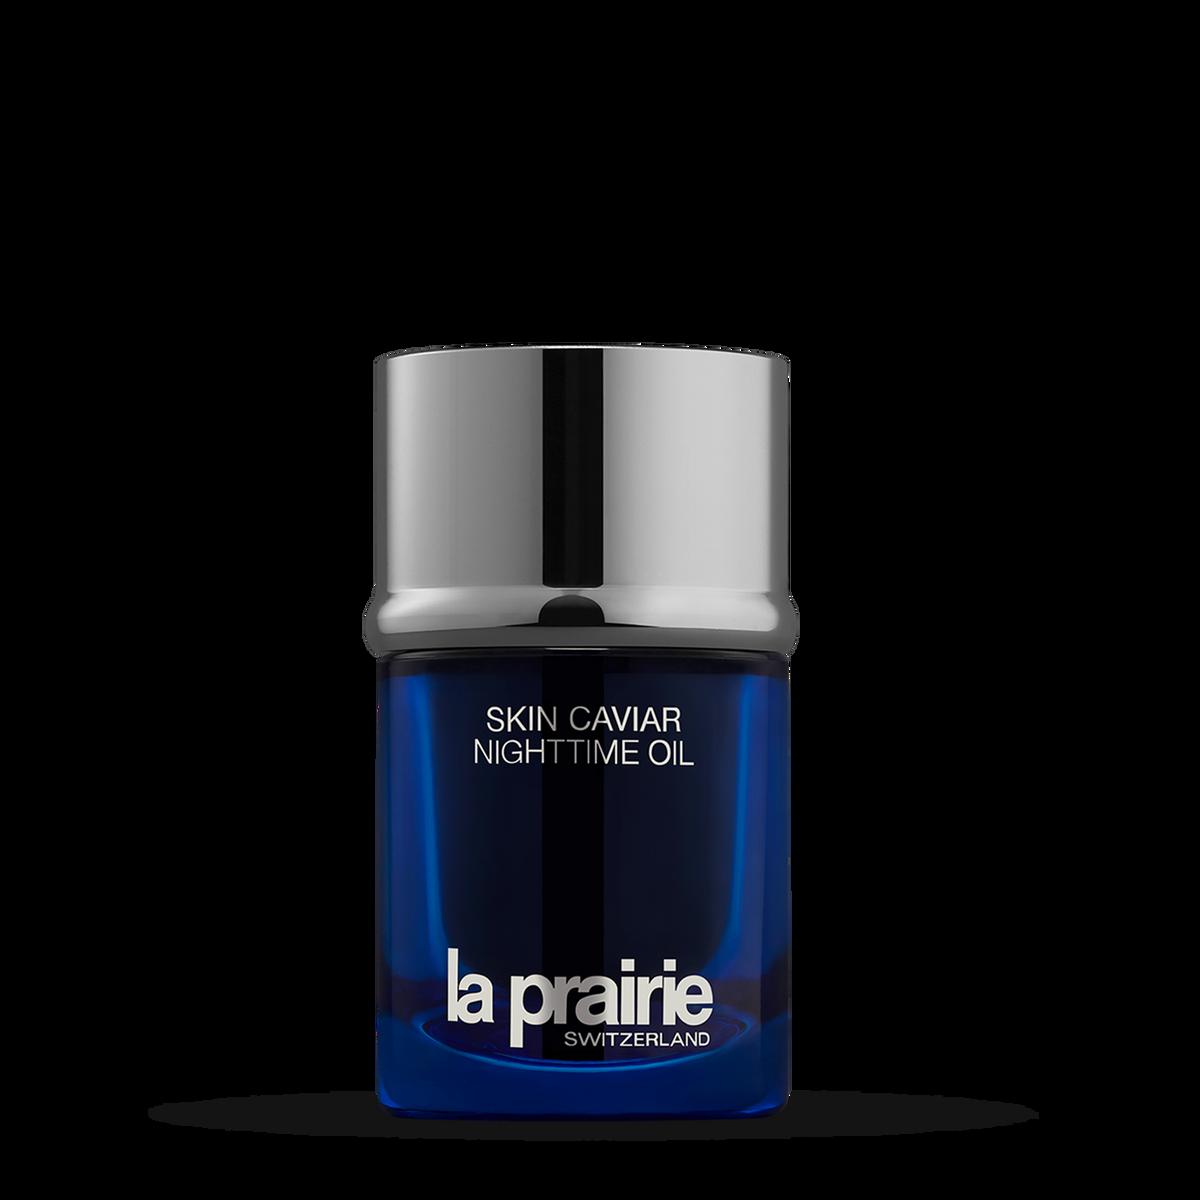 Skin Caviar Nighttime Oil